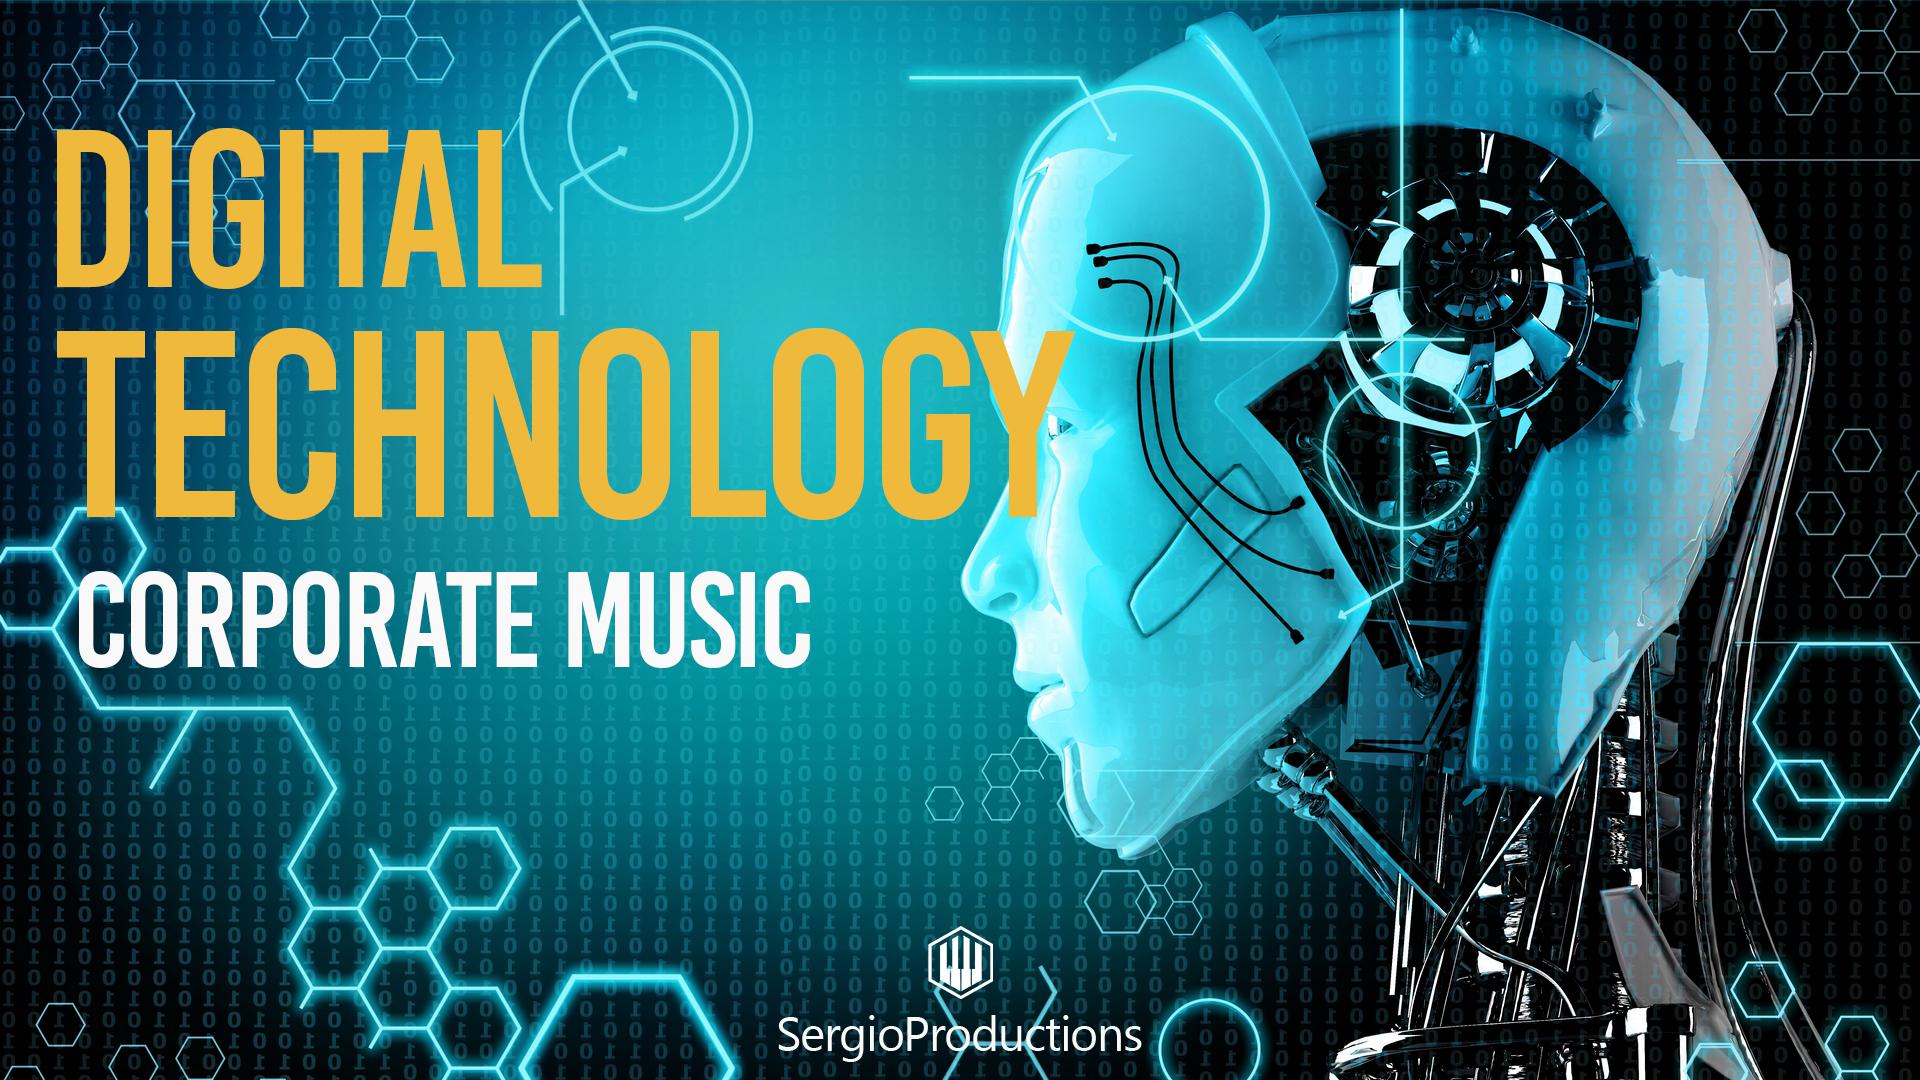 Corporate-Digital-Technology